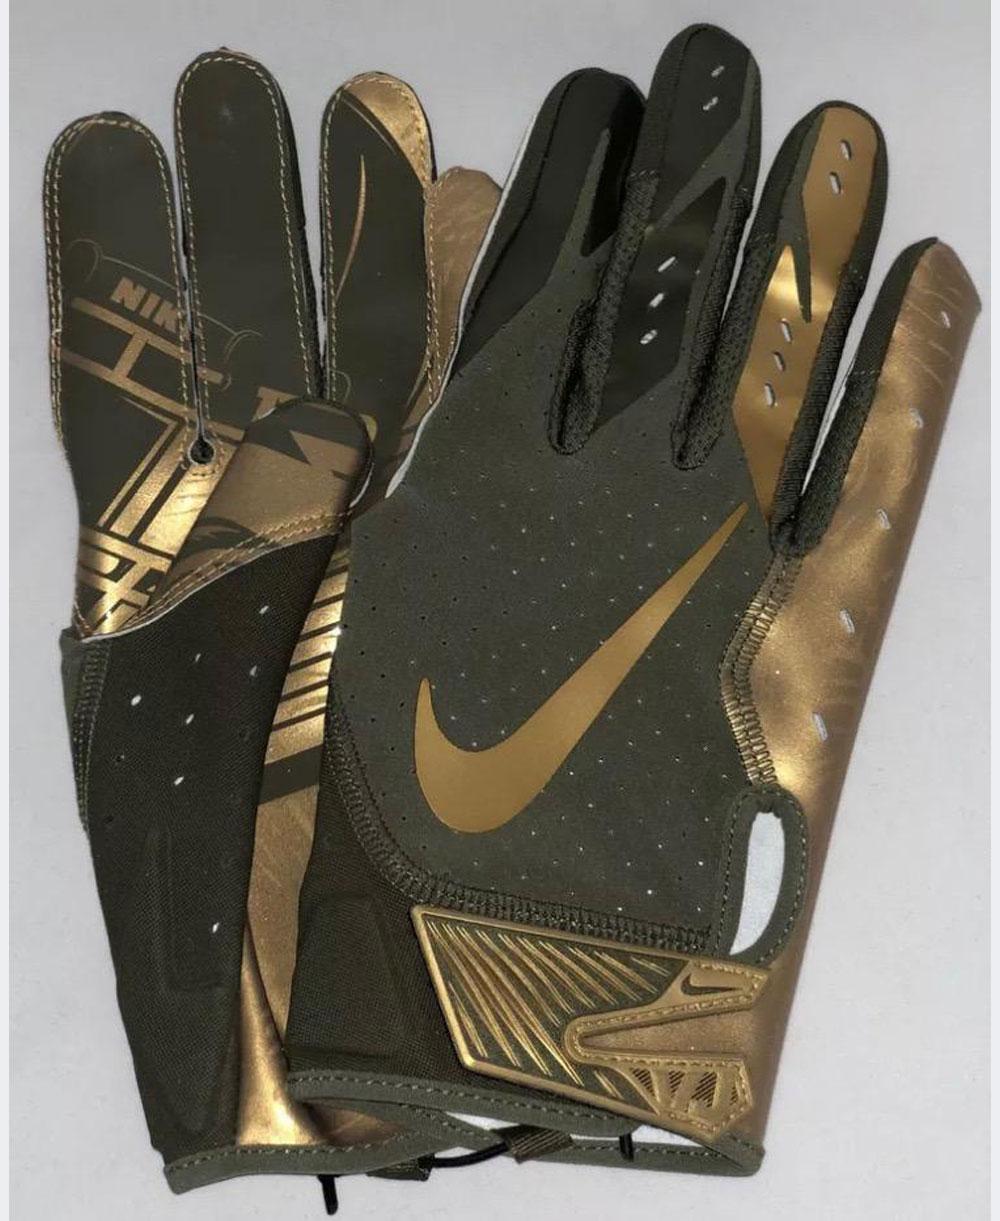 Vapor Jet 5 Men's Football Gloves Medium Olive/Metallic Gold